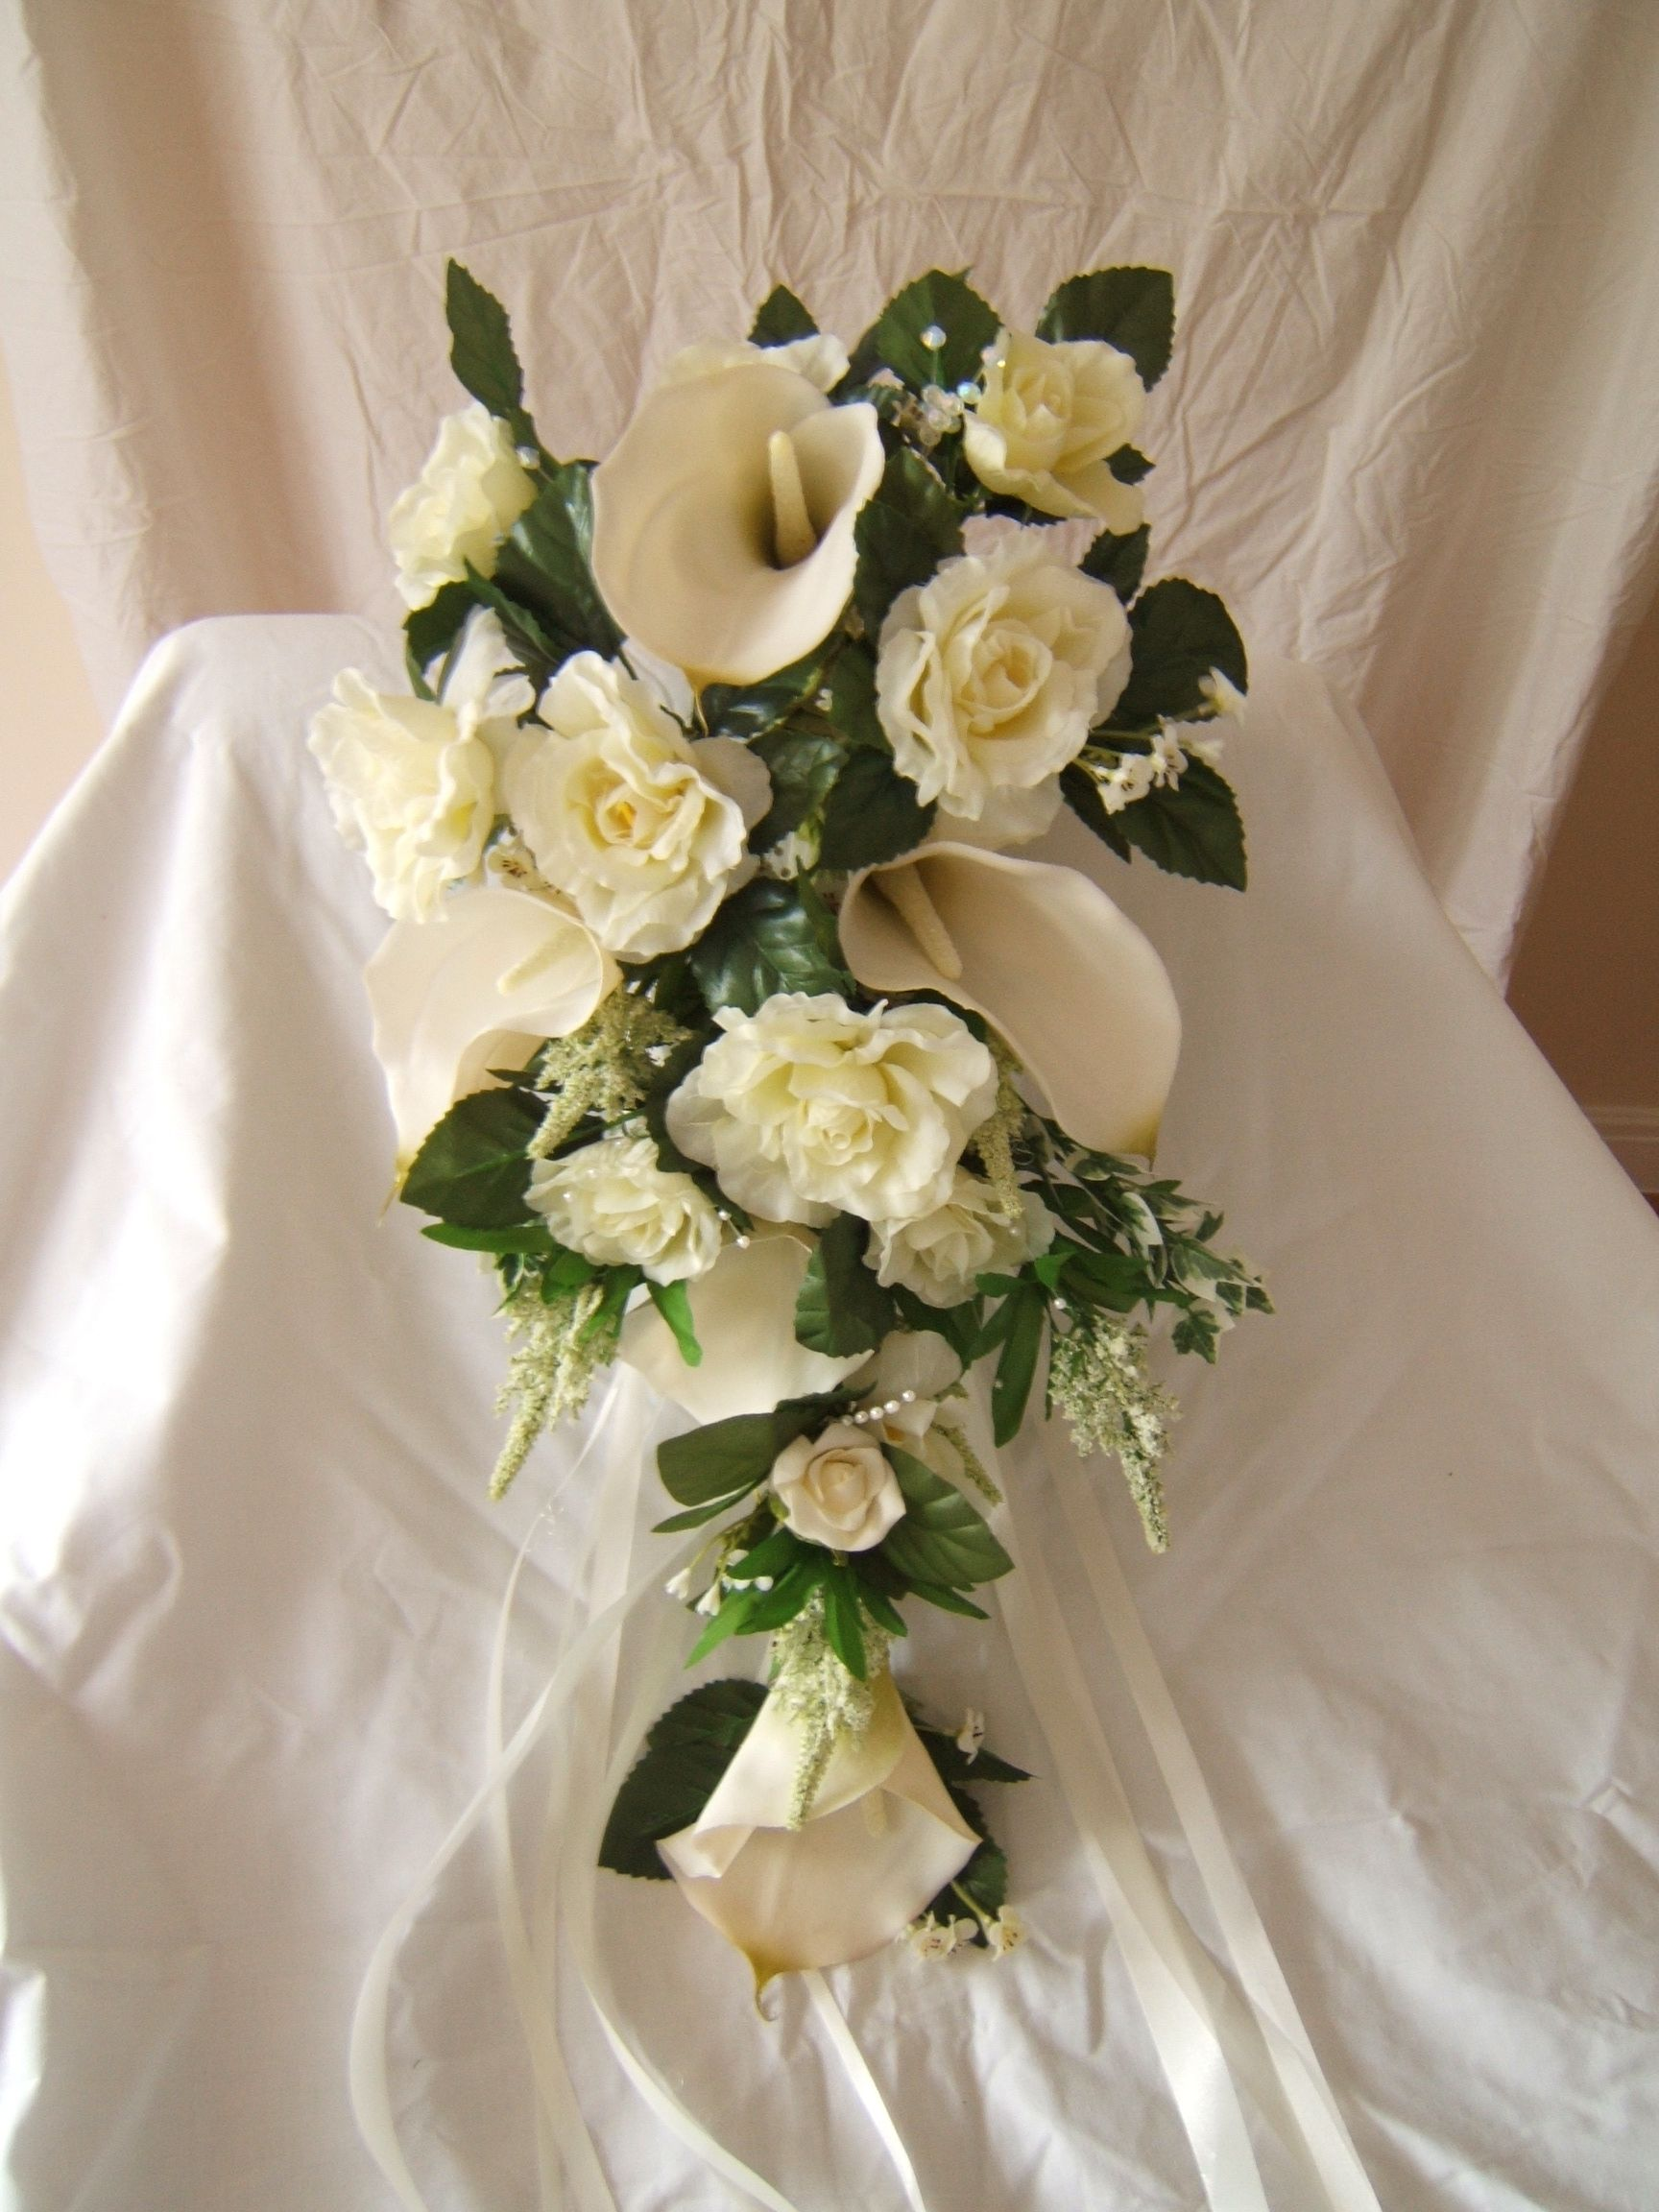 Outstanding silk wedding flowers and accessories silk wedding outstanding silk wedding flowers and accessories silk wedding bouquets for brides izmirmasajfo